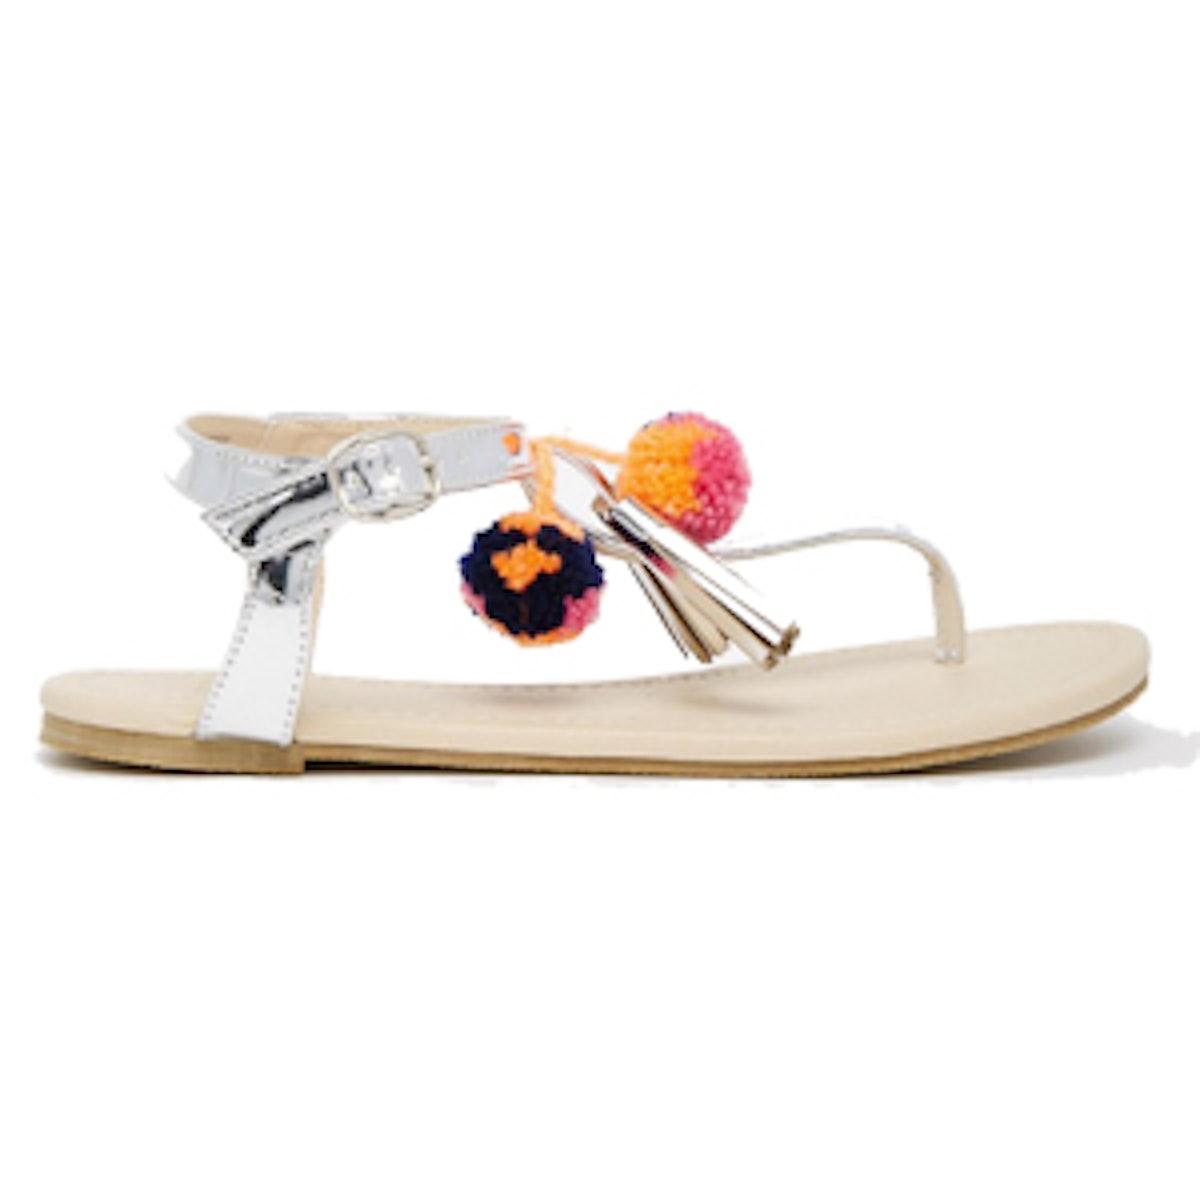 Fruit Loop Pom Sandals